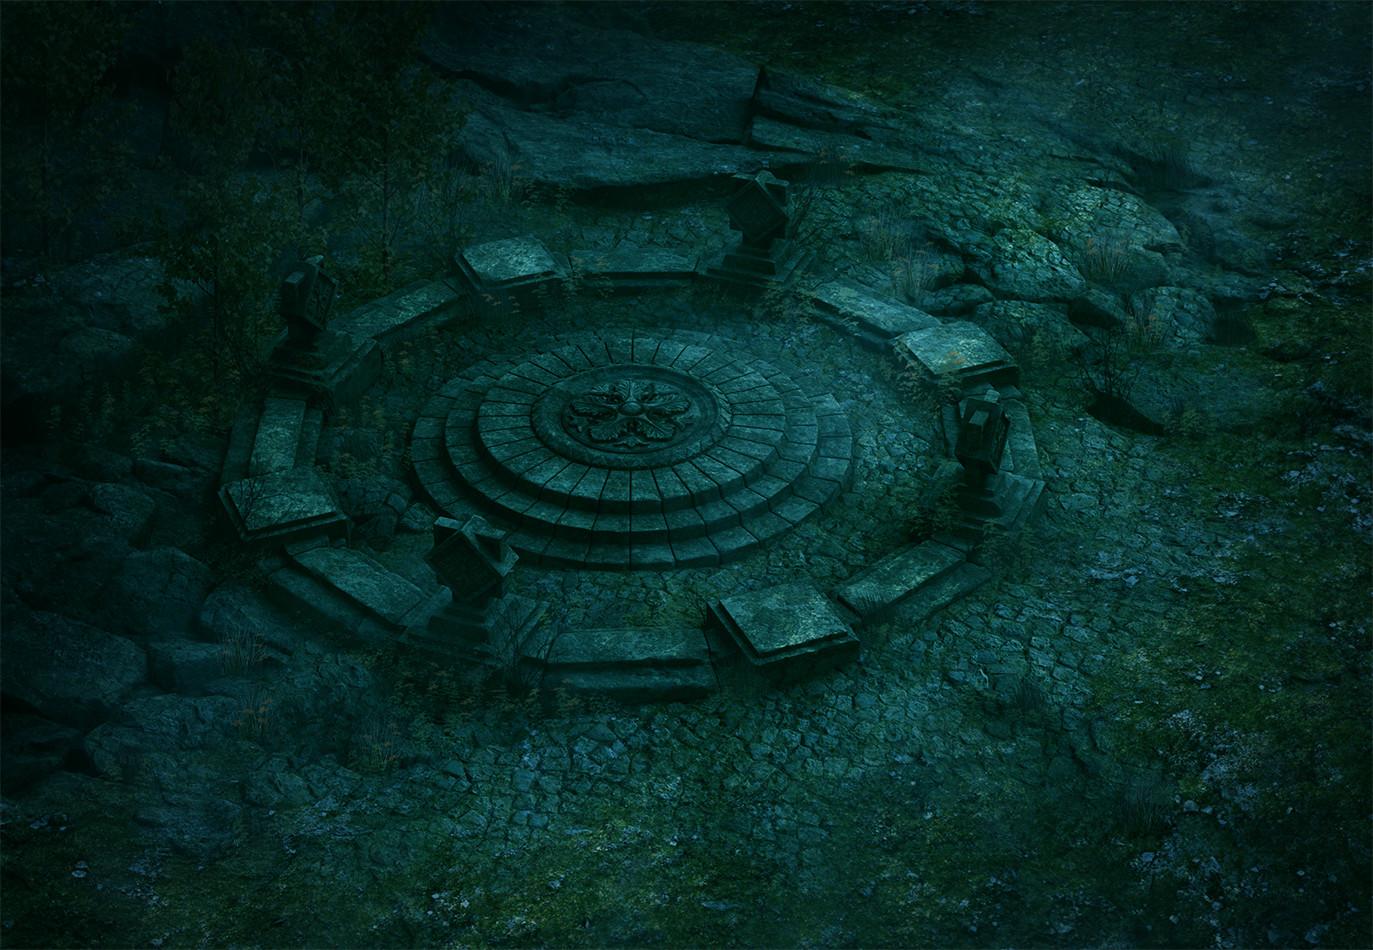 Ste flack stone circle night